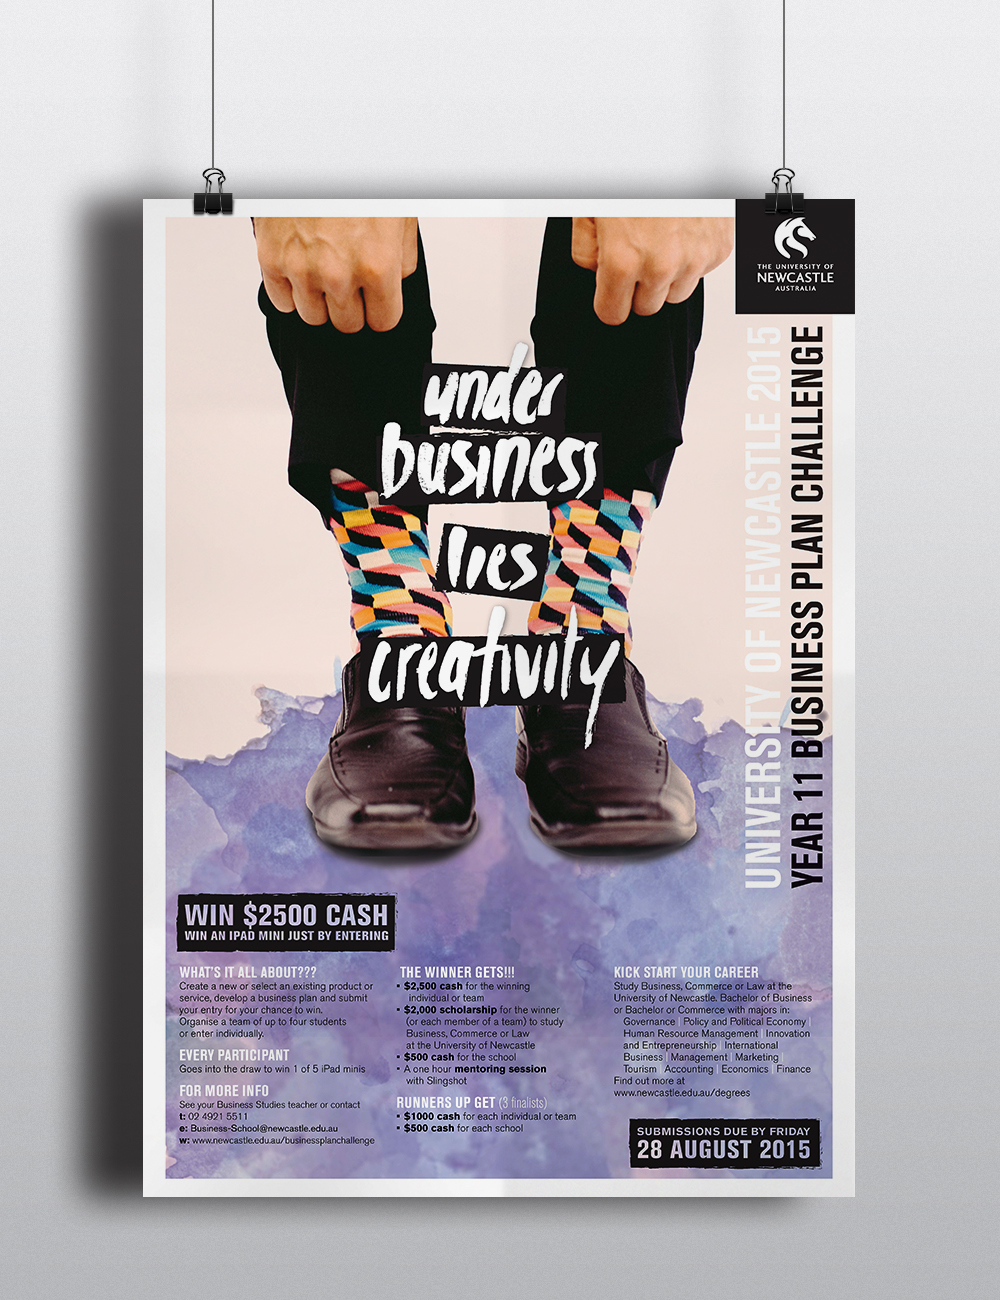 newcastle business school australia